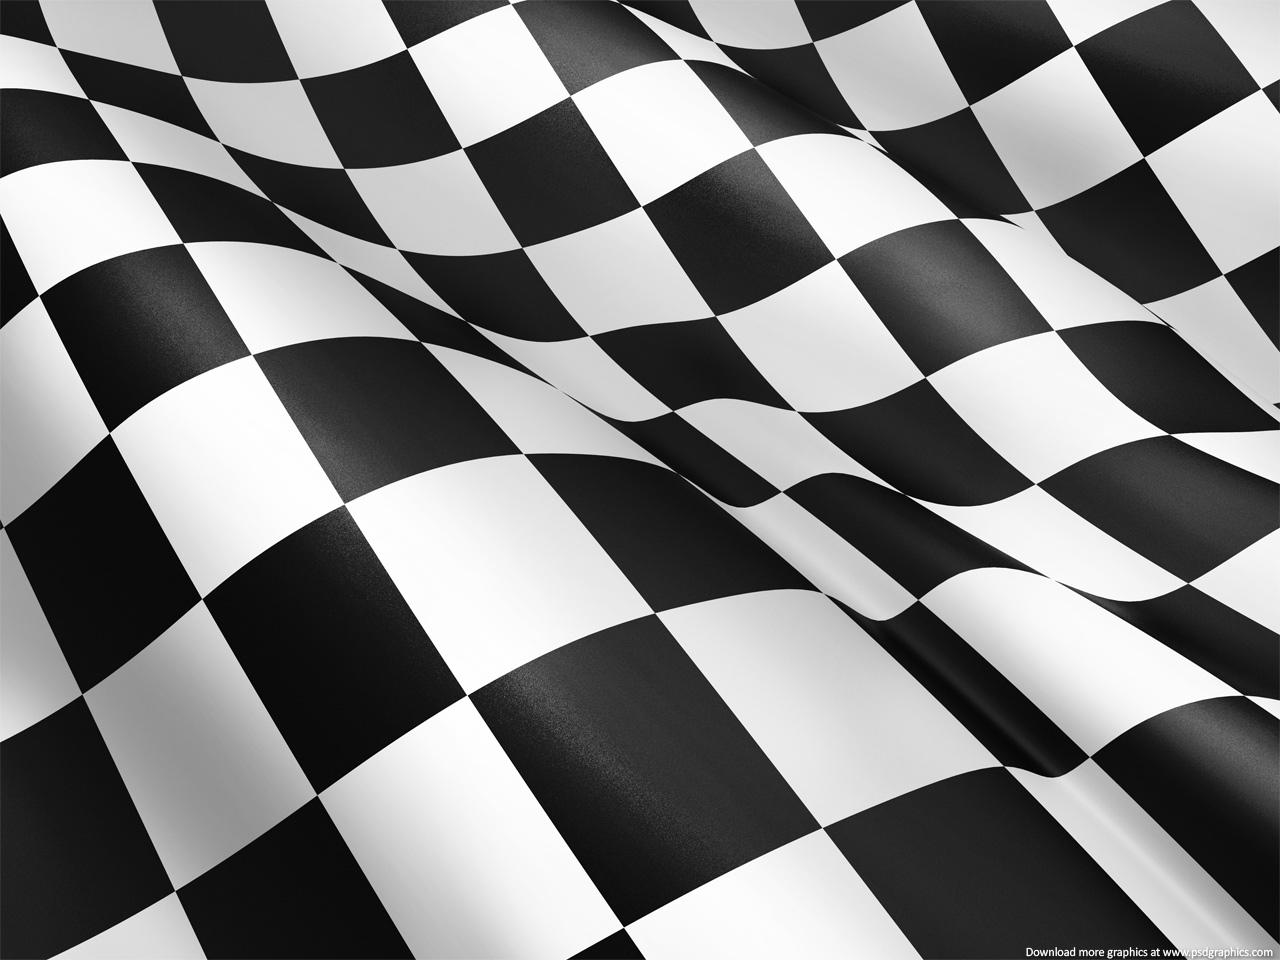 Checkered flag PSDGraphics 1280x960